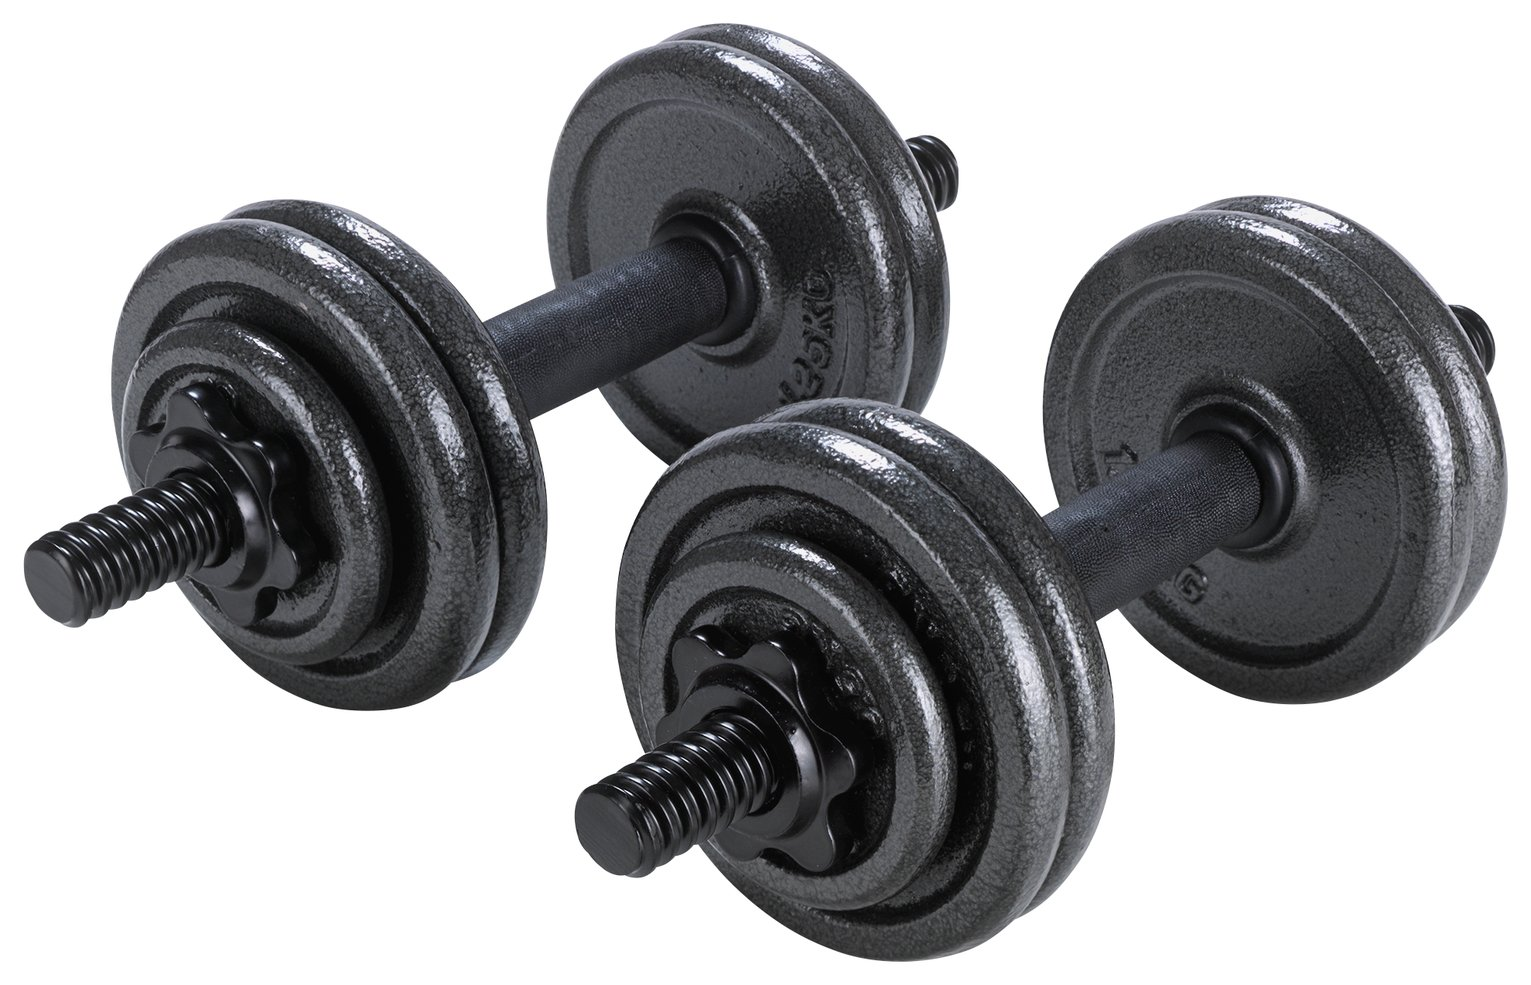 Opti Cast Iron Dumbbell Set 20kg